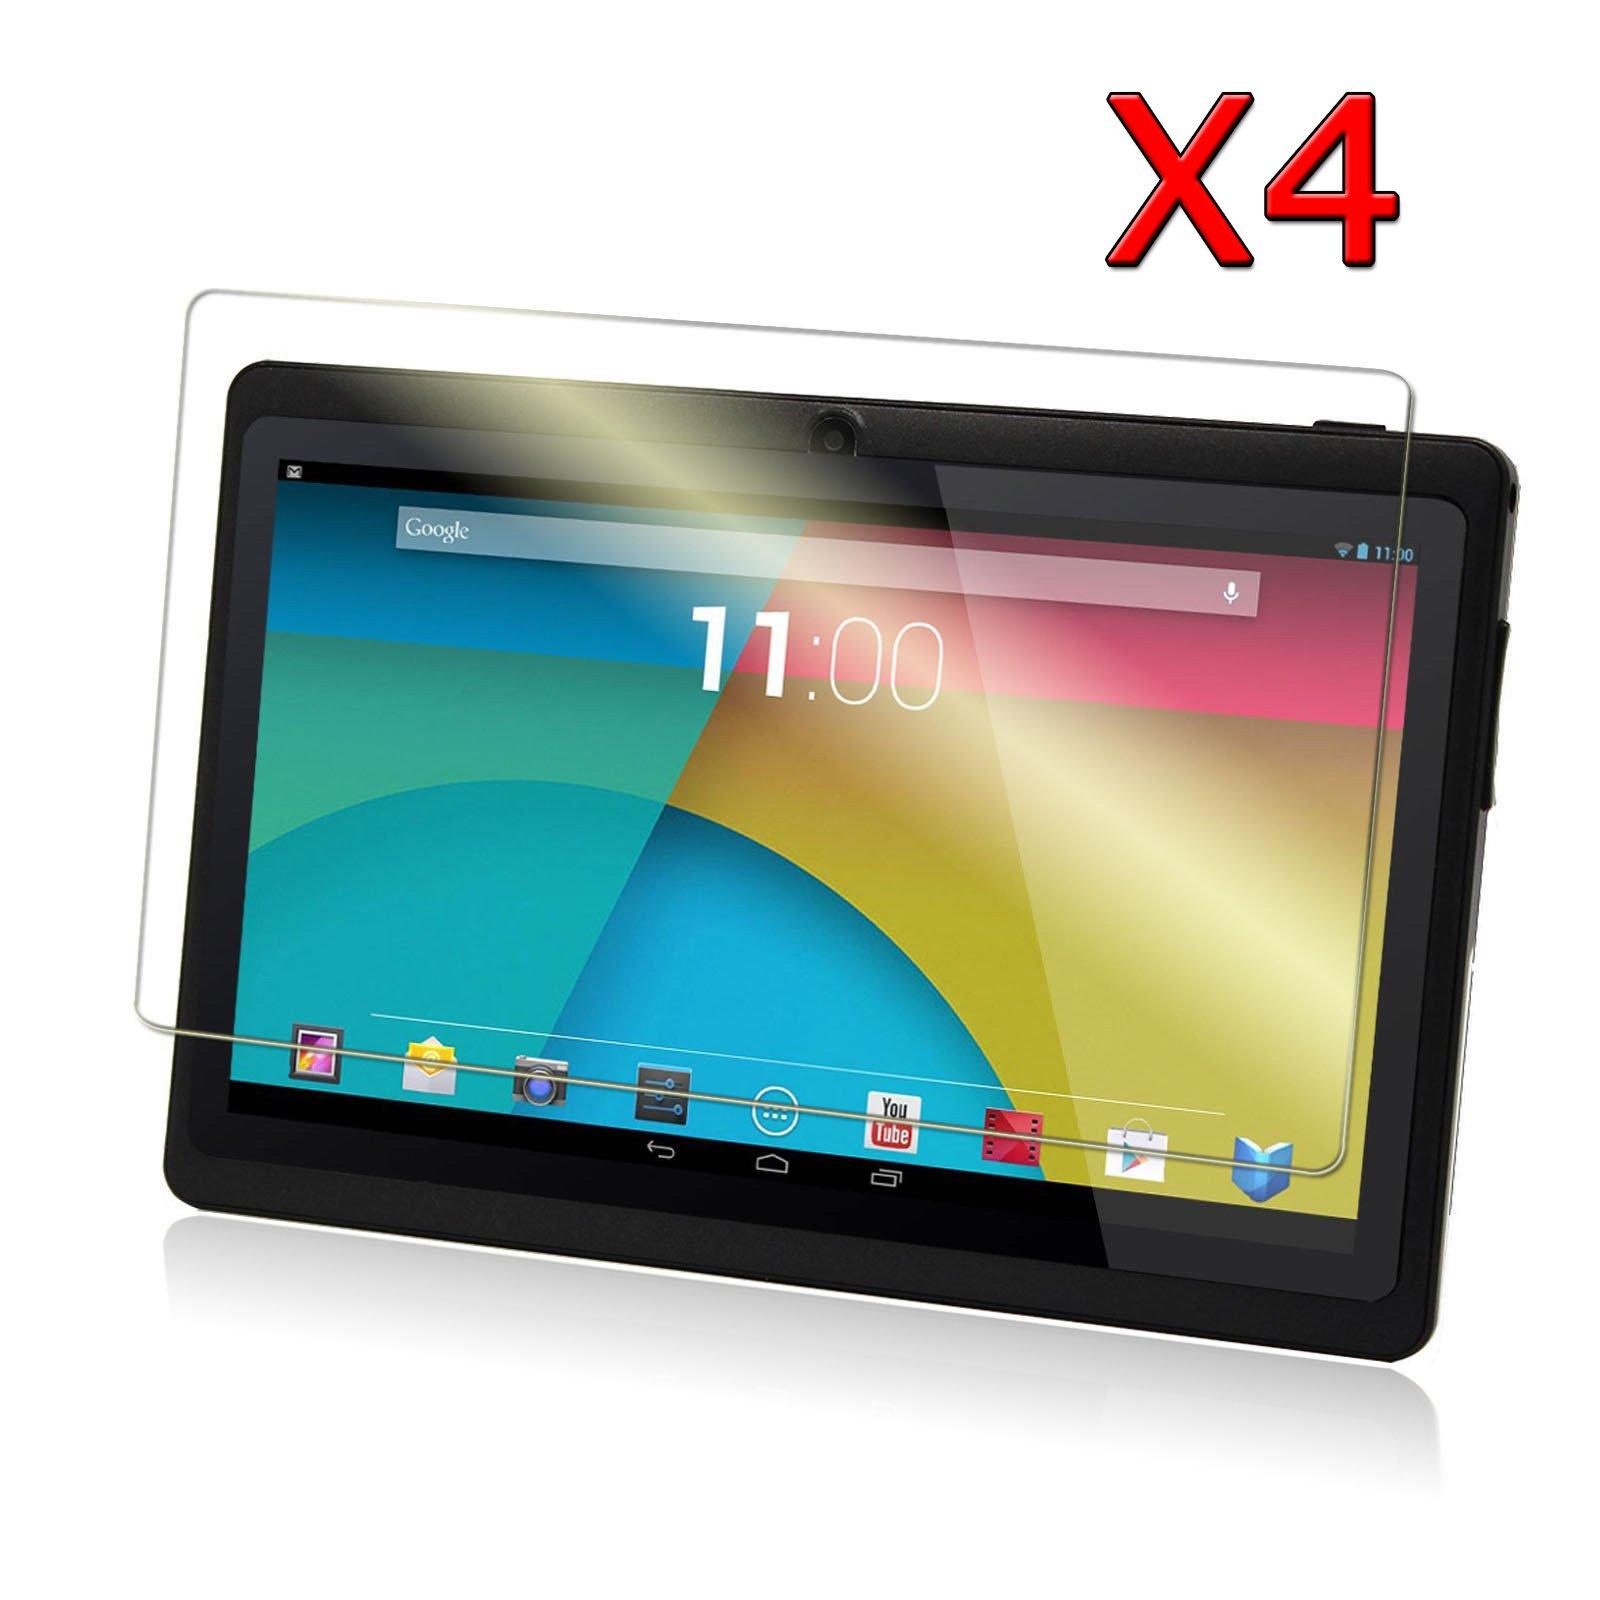 Transwon 4-Pack Ultra-Clear HD Screen Protector for 7 Inch Android Tablet inclu. Dragon Touch Y88X Plus, Y88 Q88, Alldaymall A88X A88S 7, NeuTab N7 Pro 7, DanCoTek 7, Rearway 7, Tagital T7X 7, Yuntab 7 Q88 Allwinner A23, KingPad K70 7, ProntoTec Axius Series Q9S 7, DeerBrook 7 A23, Chromo inc 7